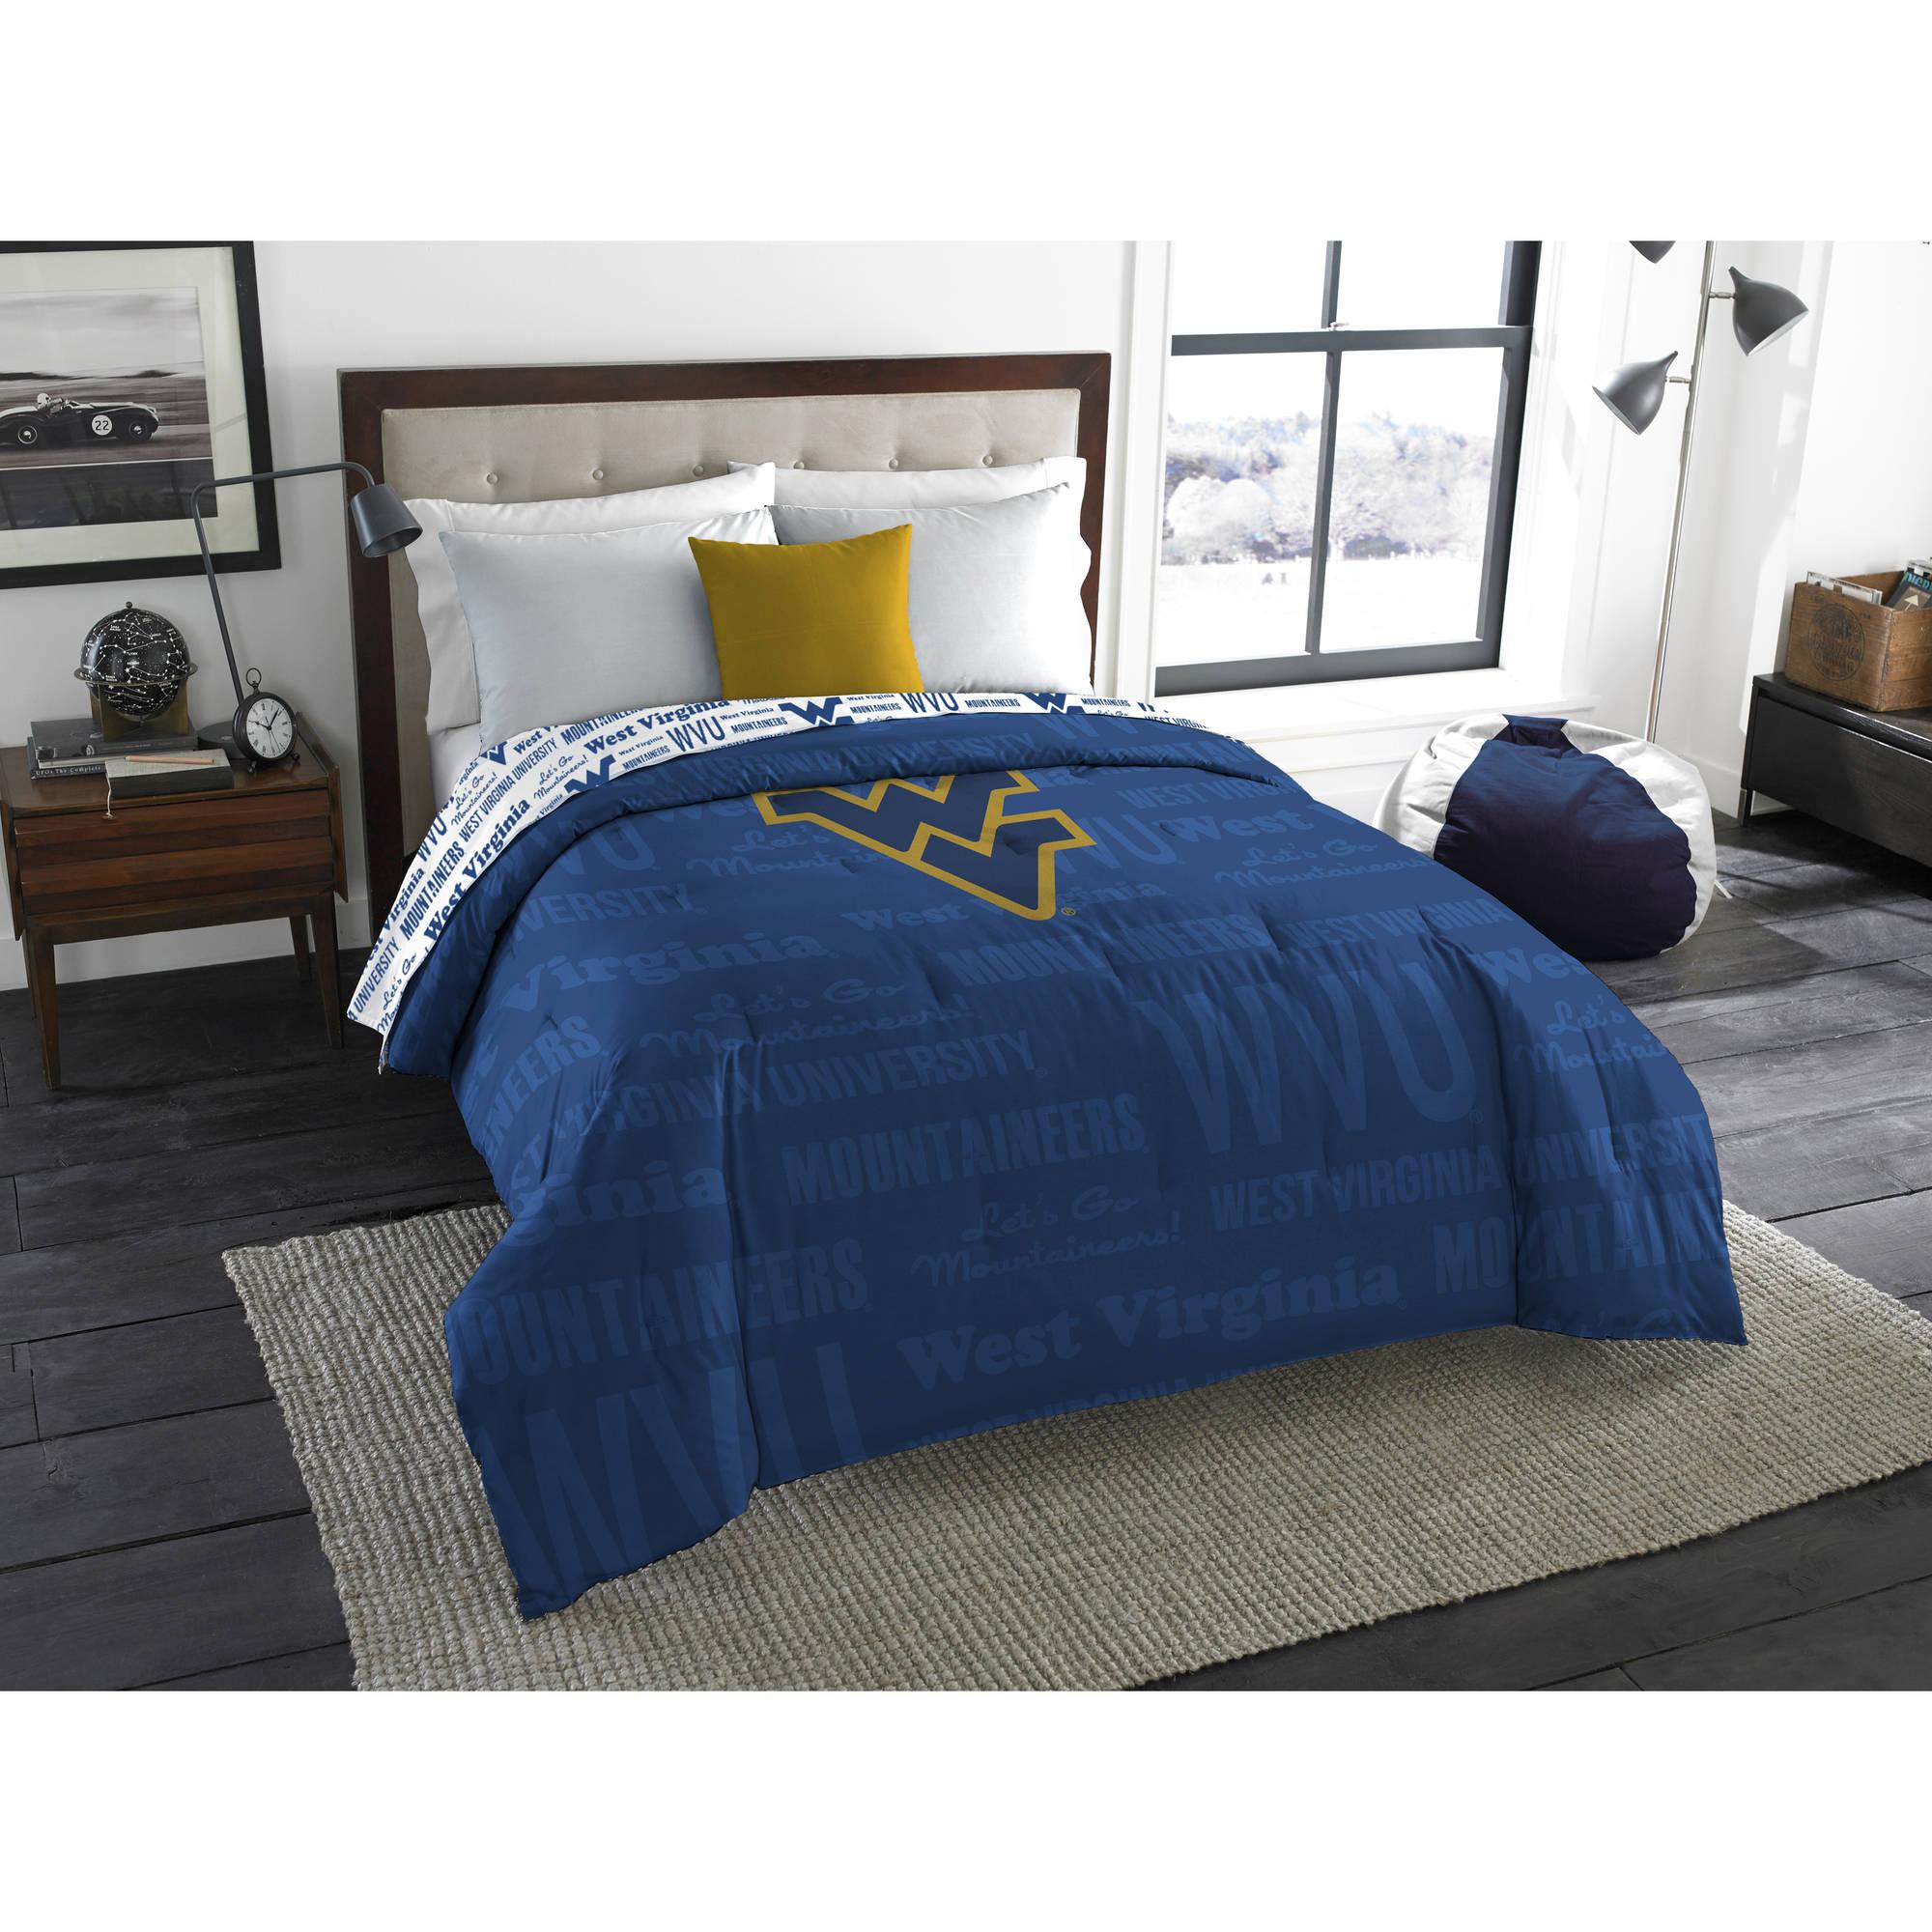 "NCAA West Virginia Mountaineers ""Anthem"" Twin/Full Bedding Comforter"